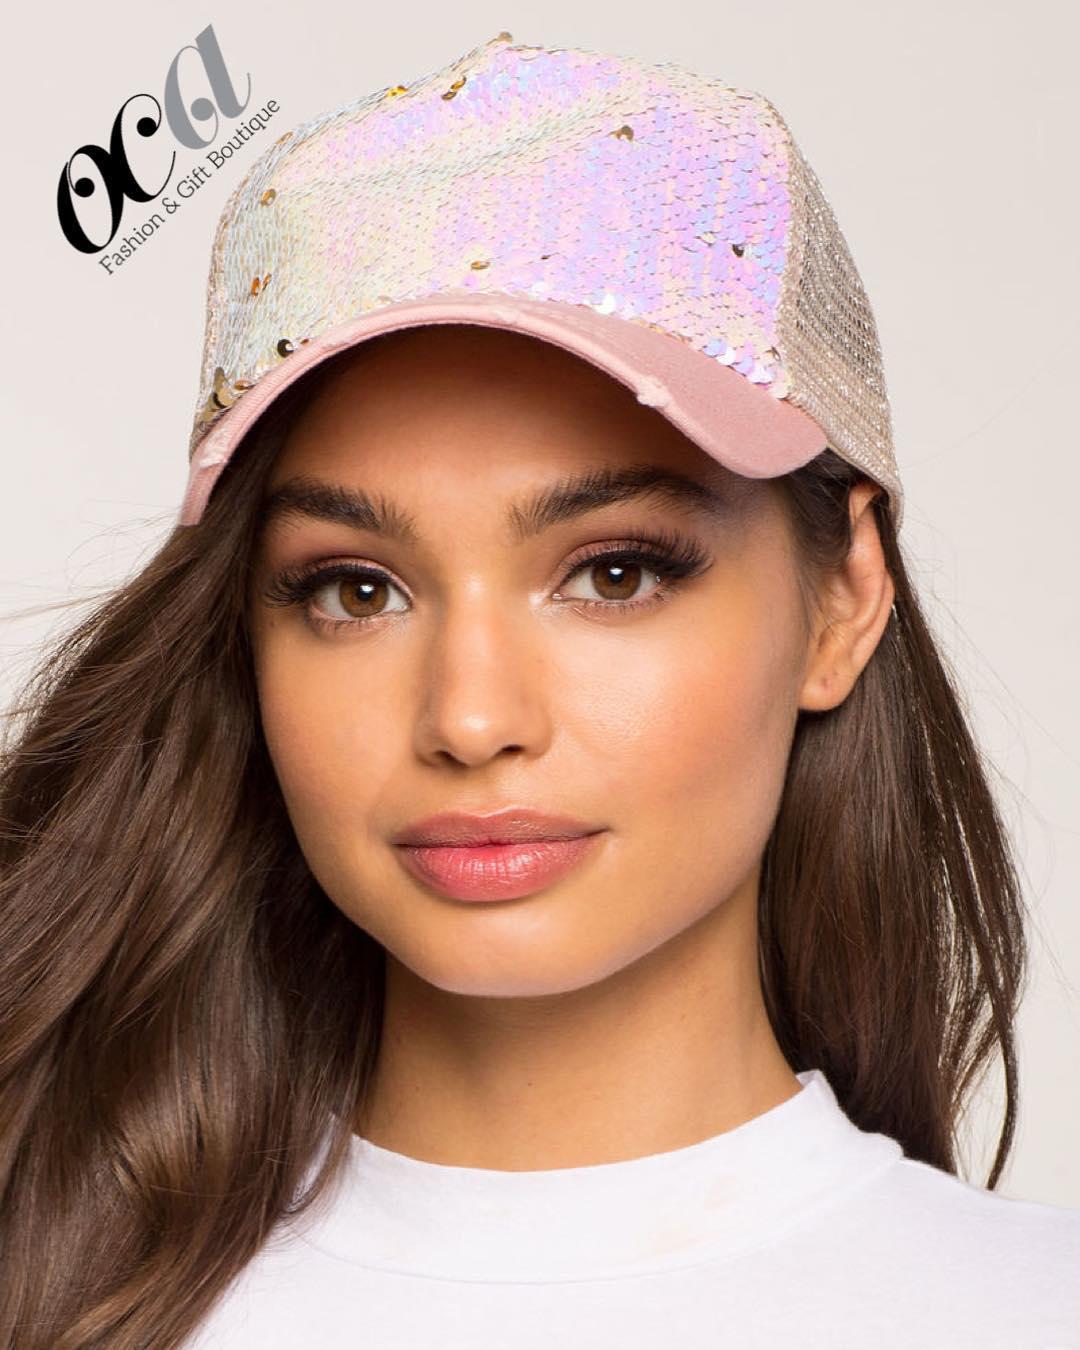 Bling BASEBALL CAPS 0Pink Glittering Matt Finish Sequins Hat